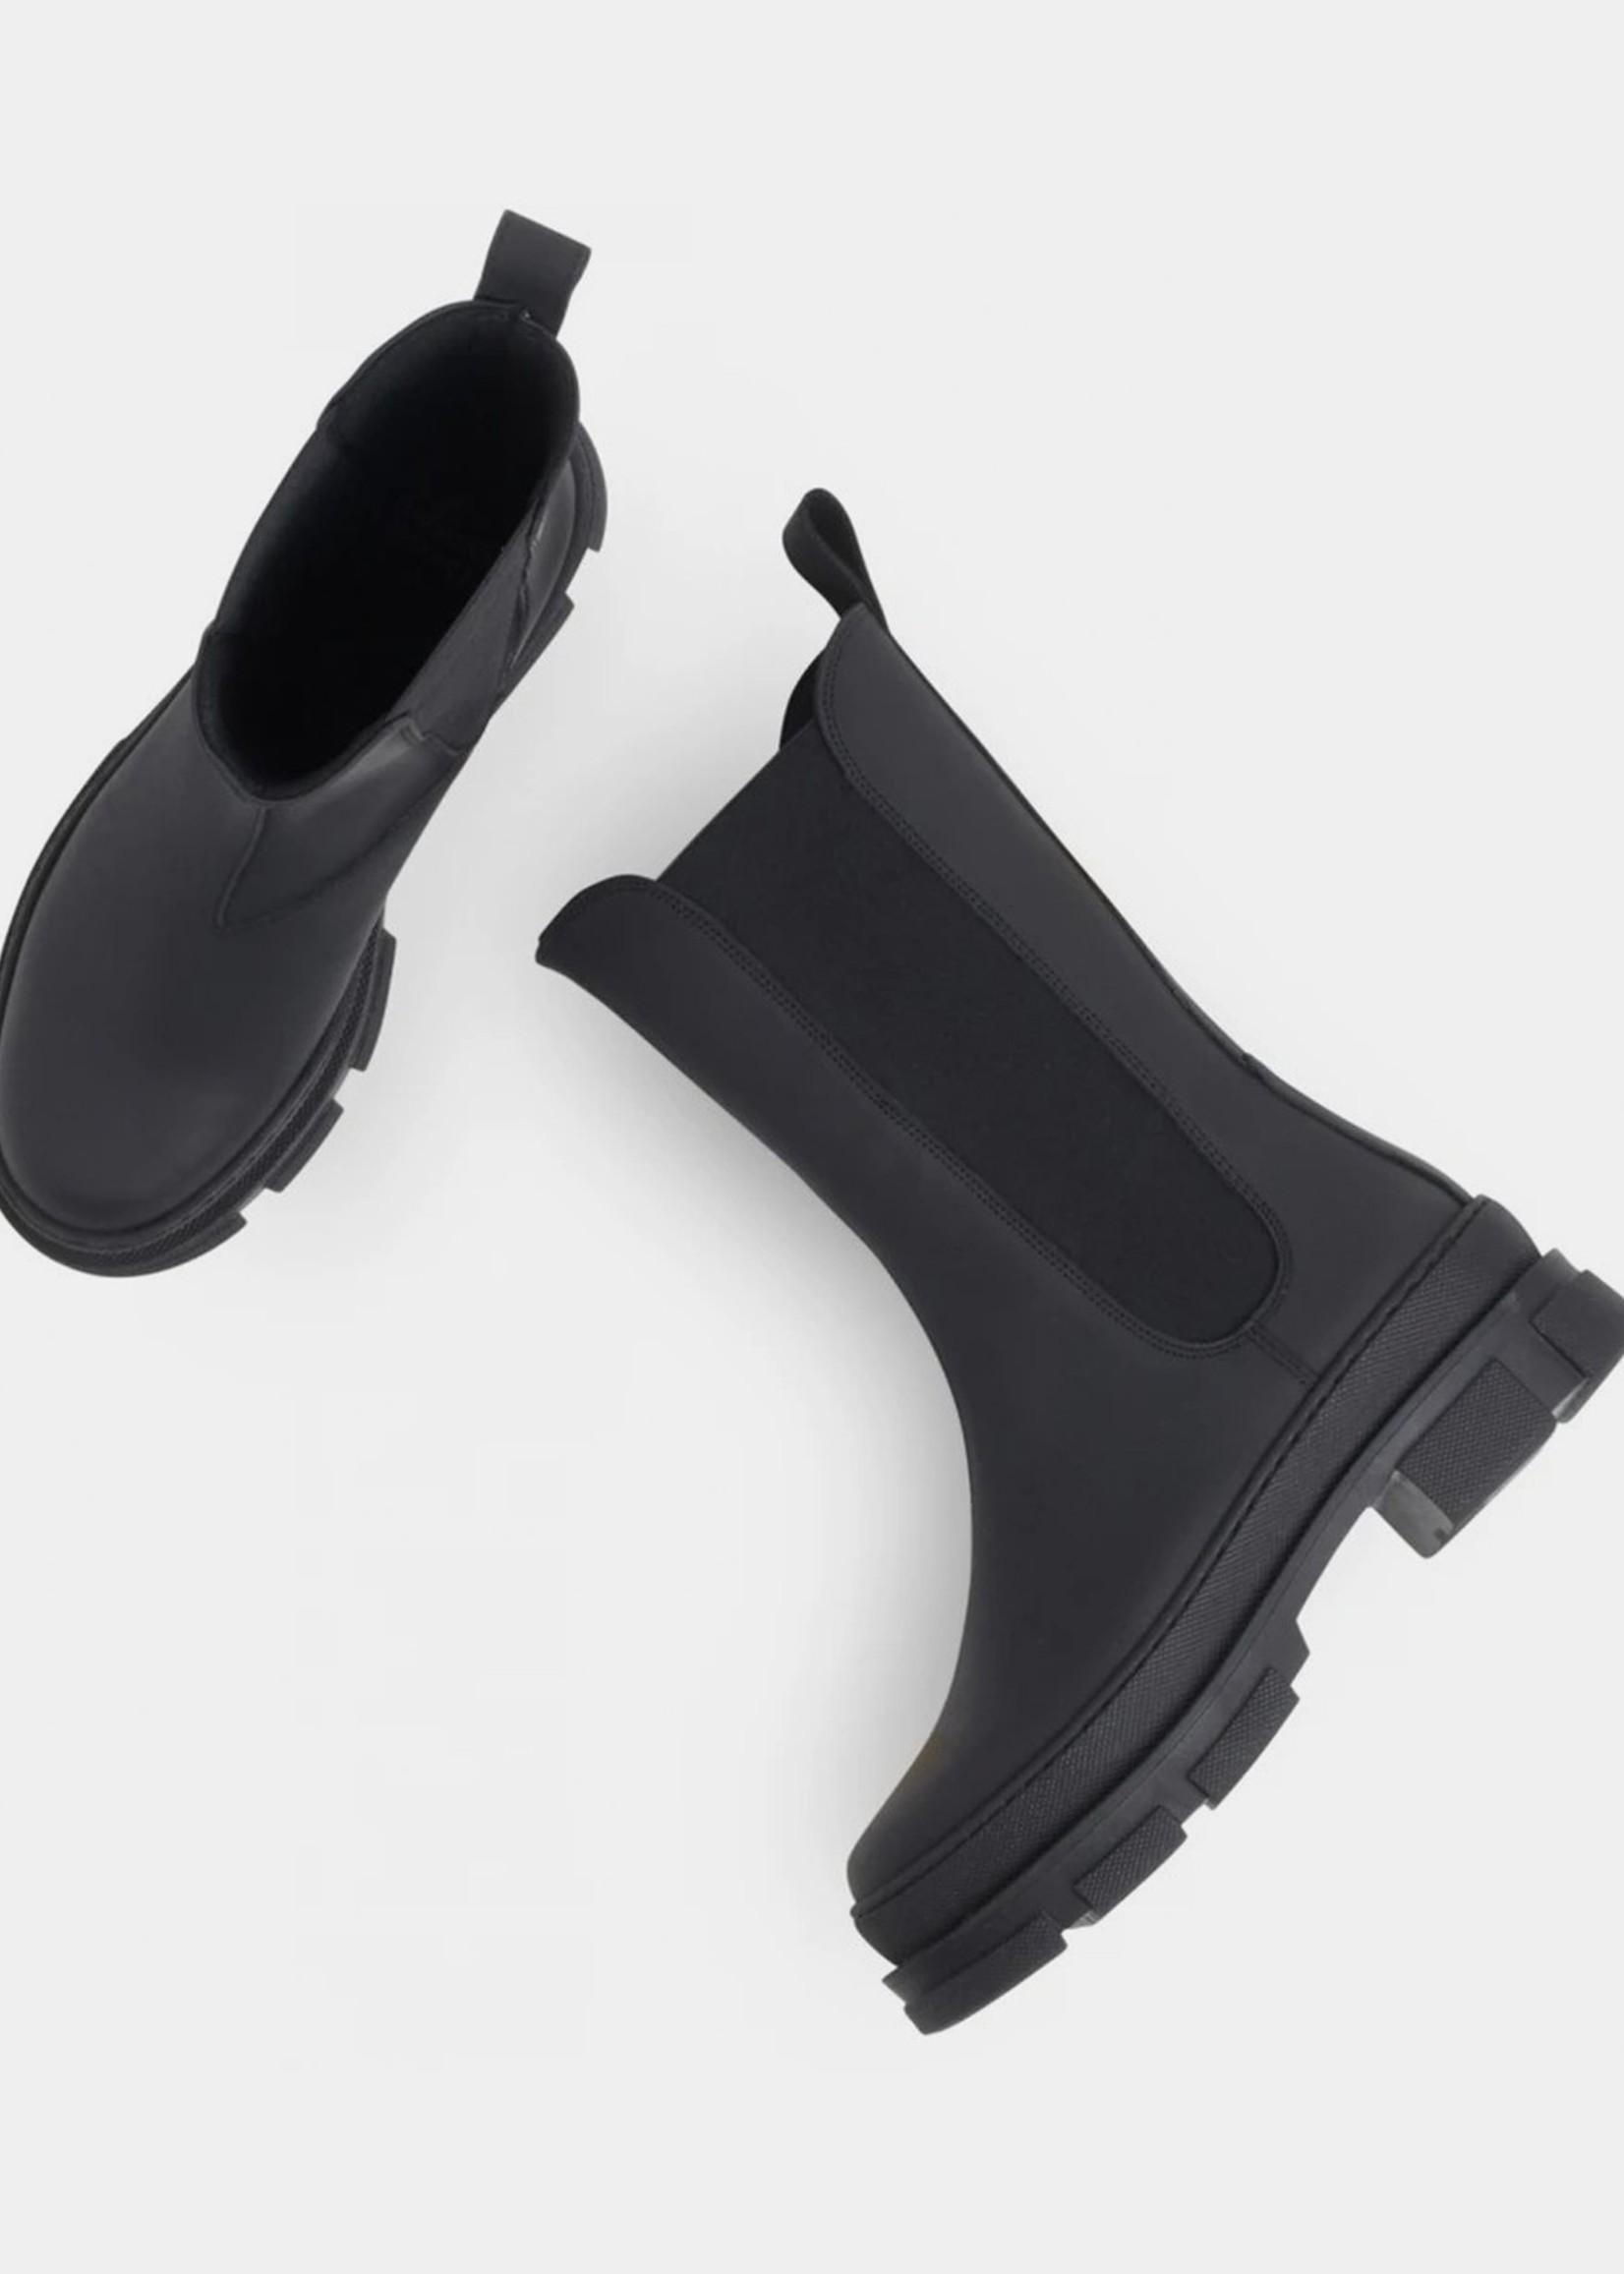 Garment Project Elise Chelsea - Black Rubberised Leather